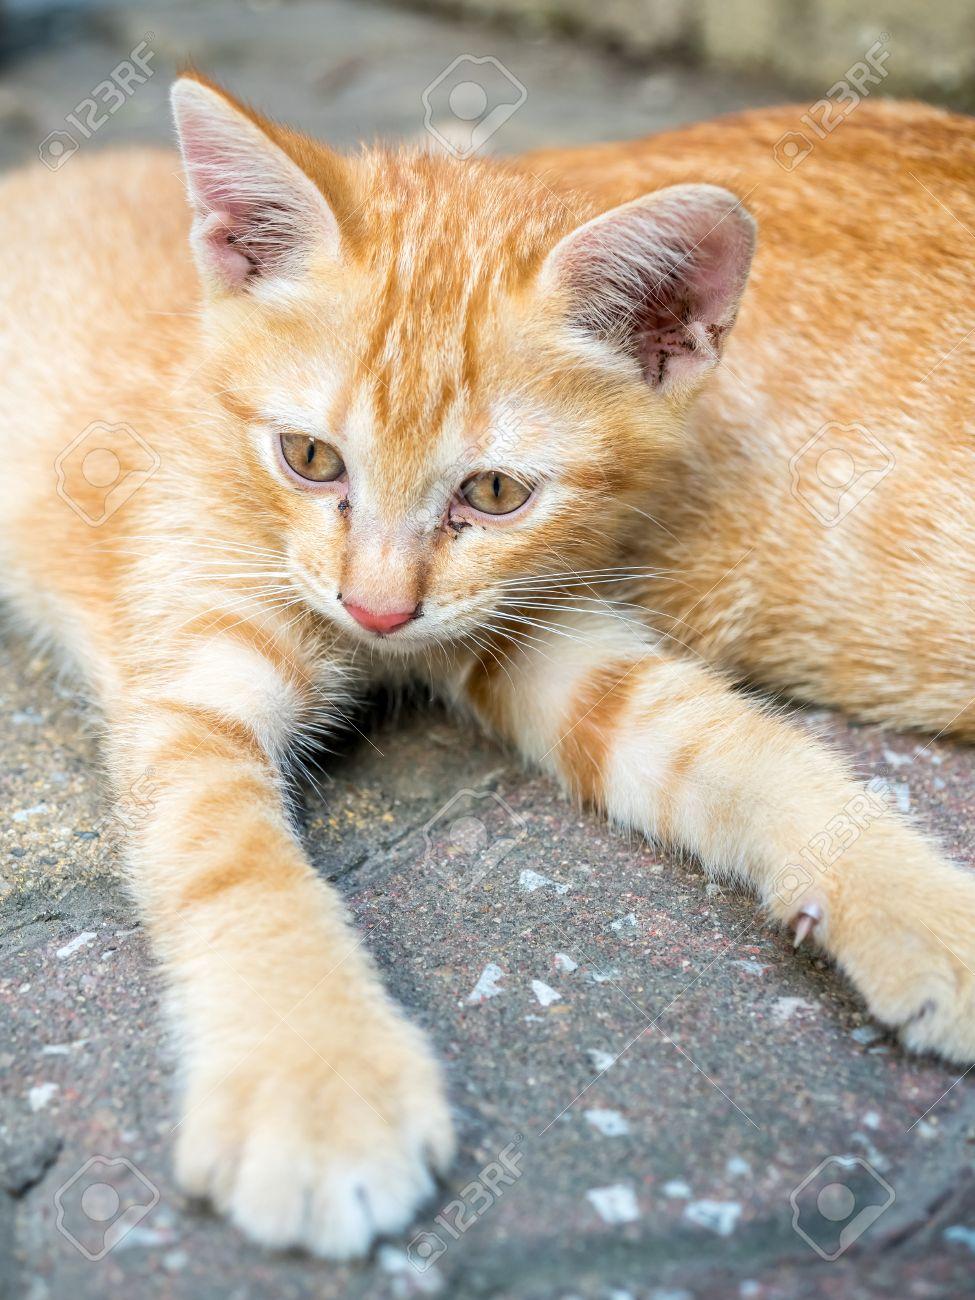 small cute golden brown kitten lay on outdoor concrete backyard